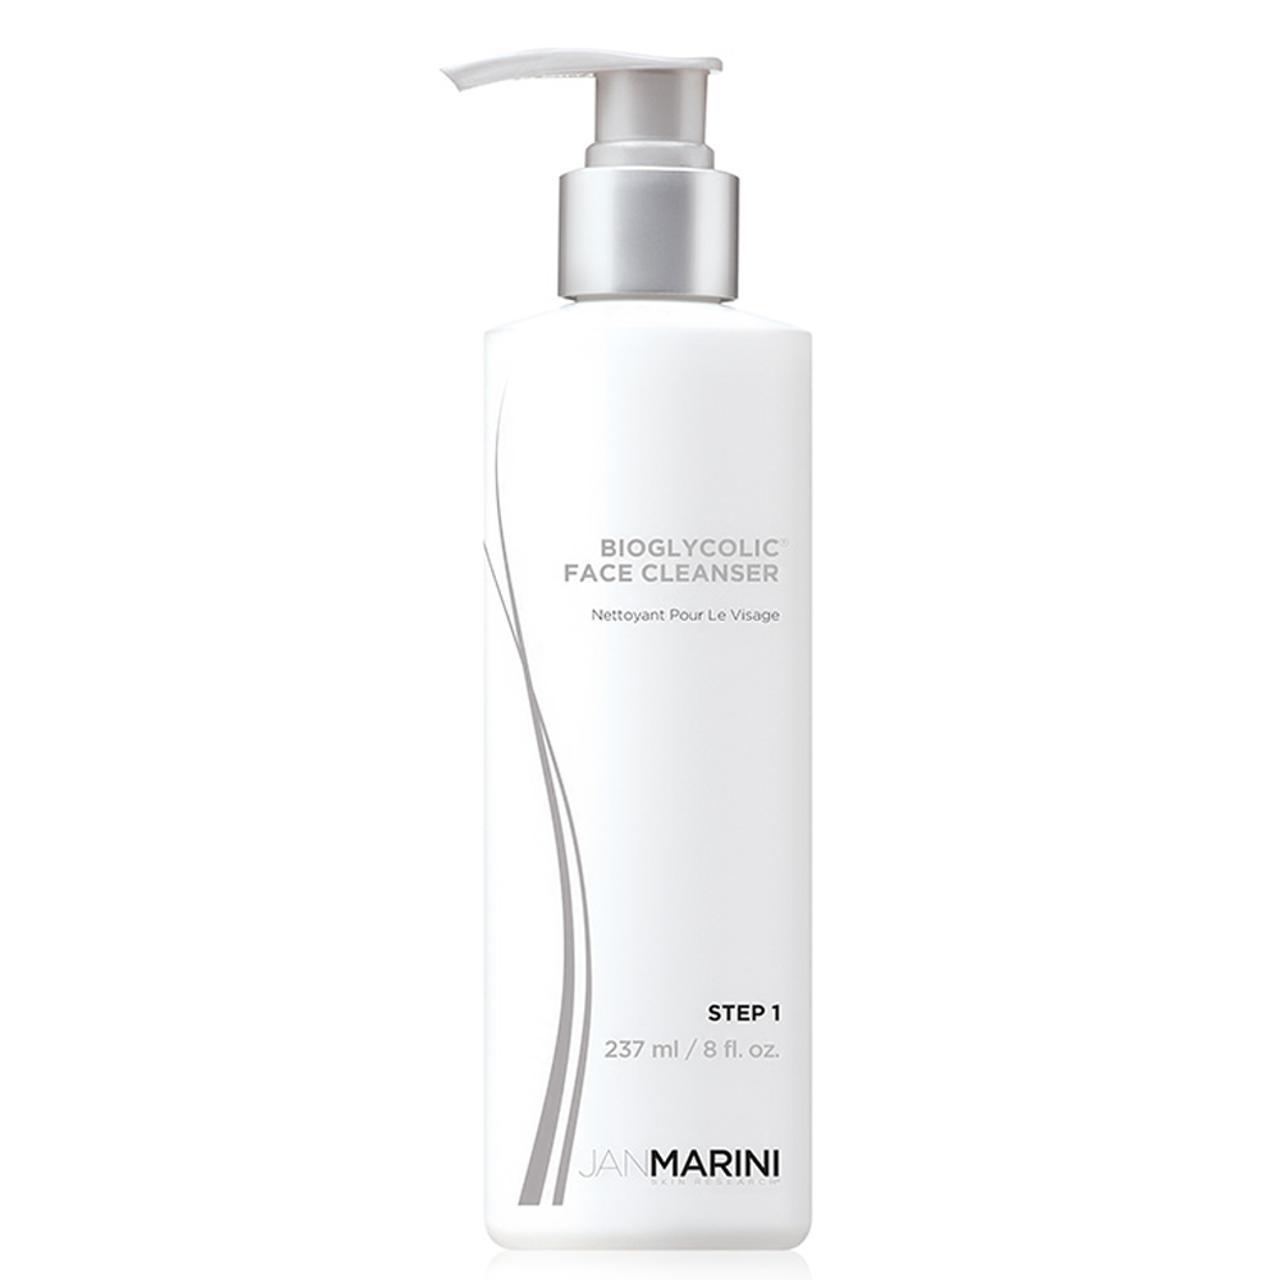 Jan Marini Bioglycolic Facial Cleanser